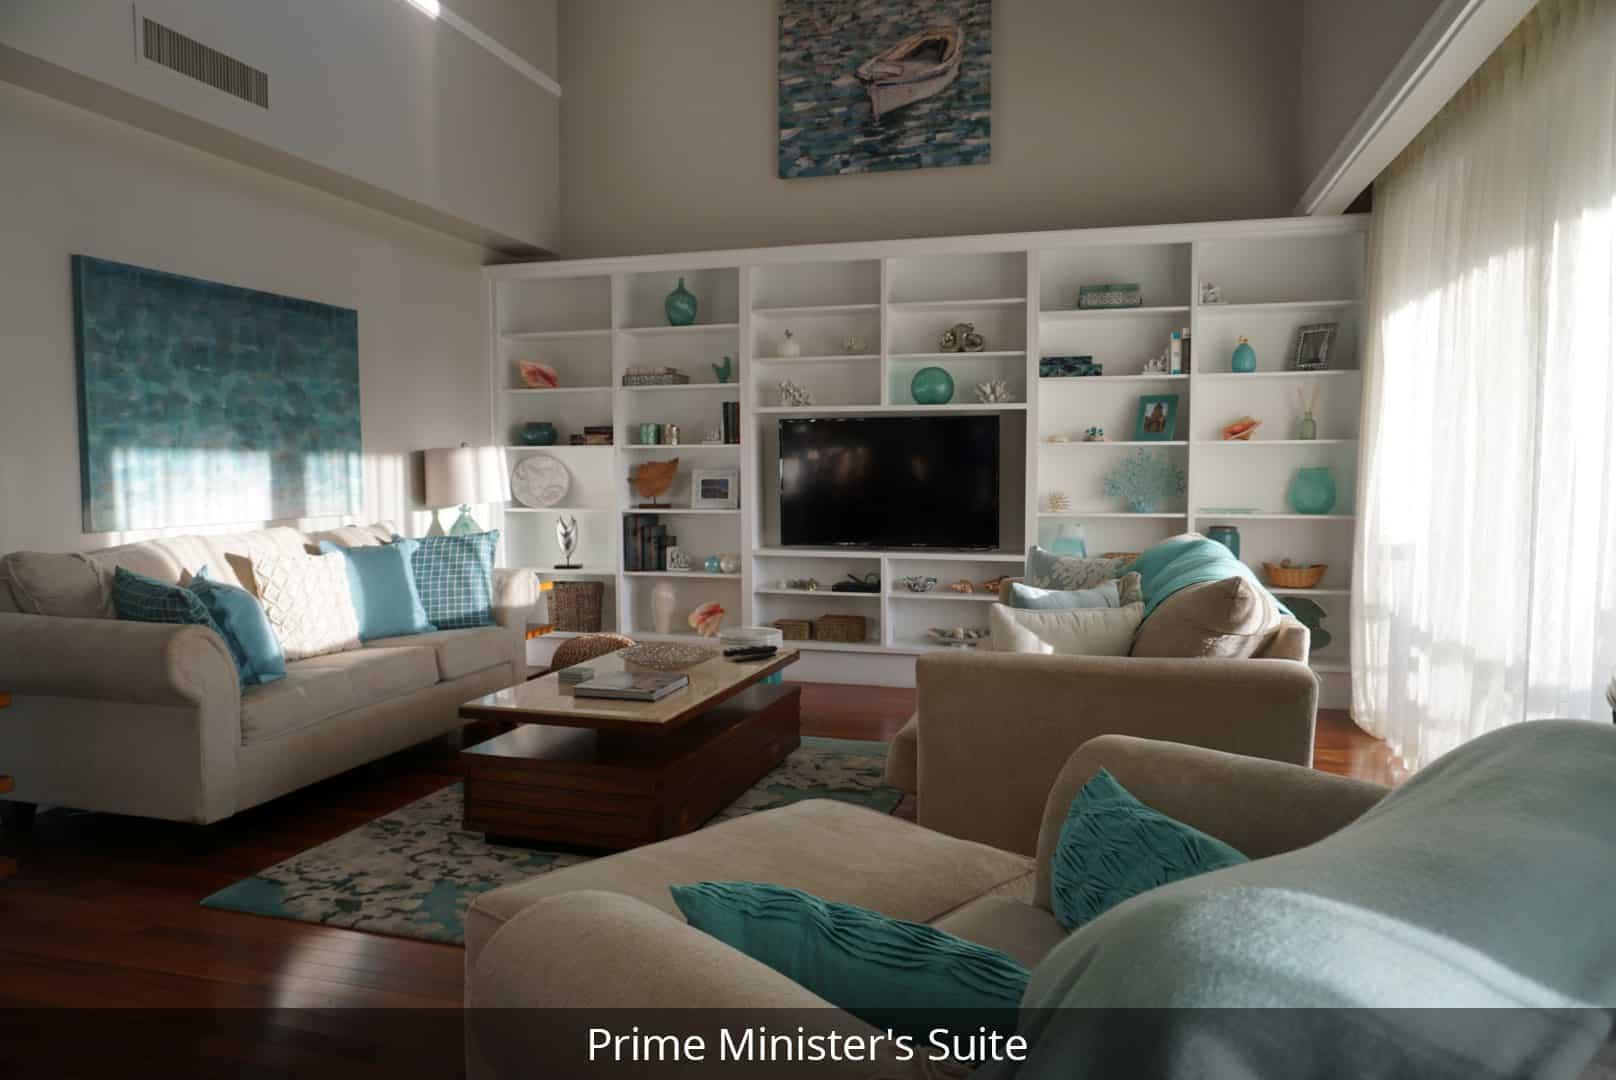 Prime Minister Suite